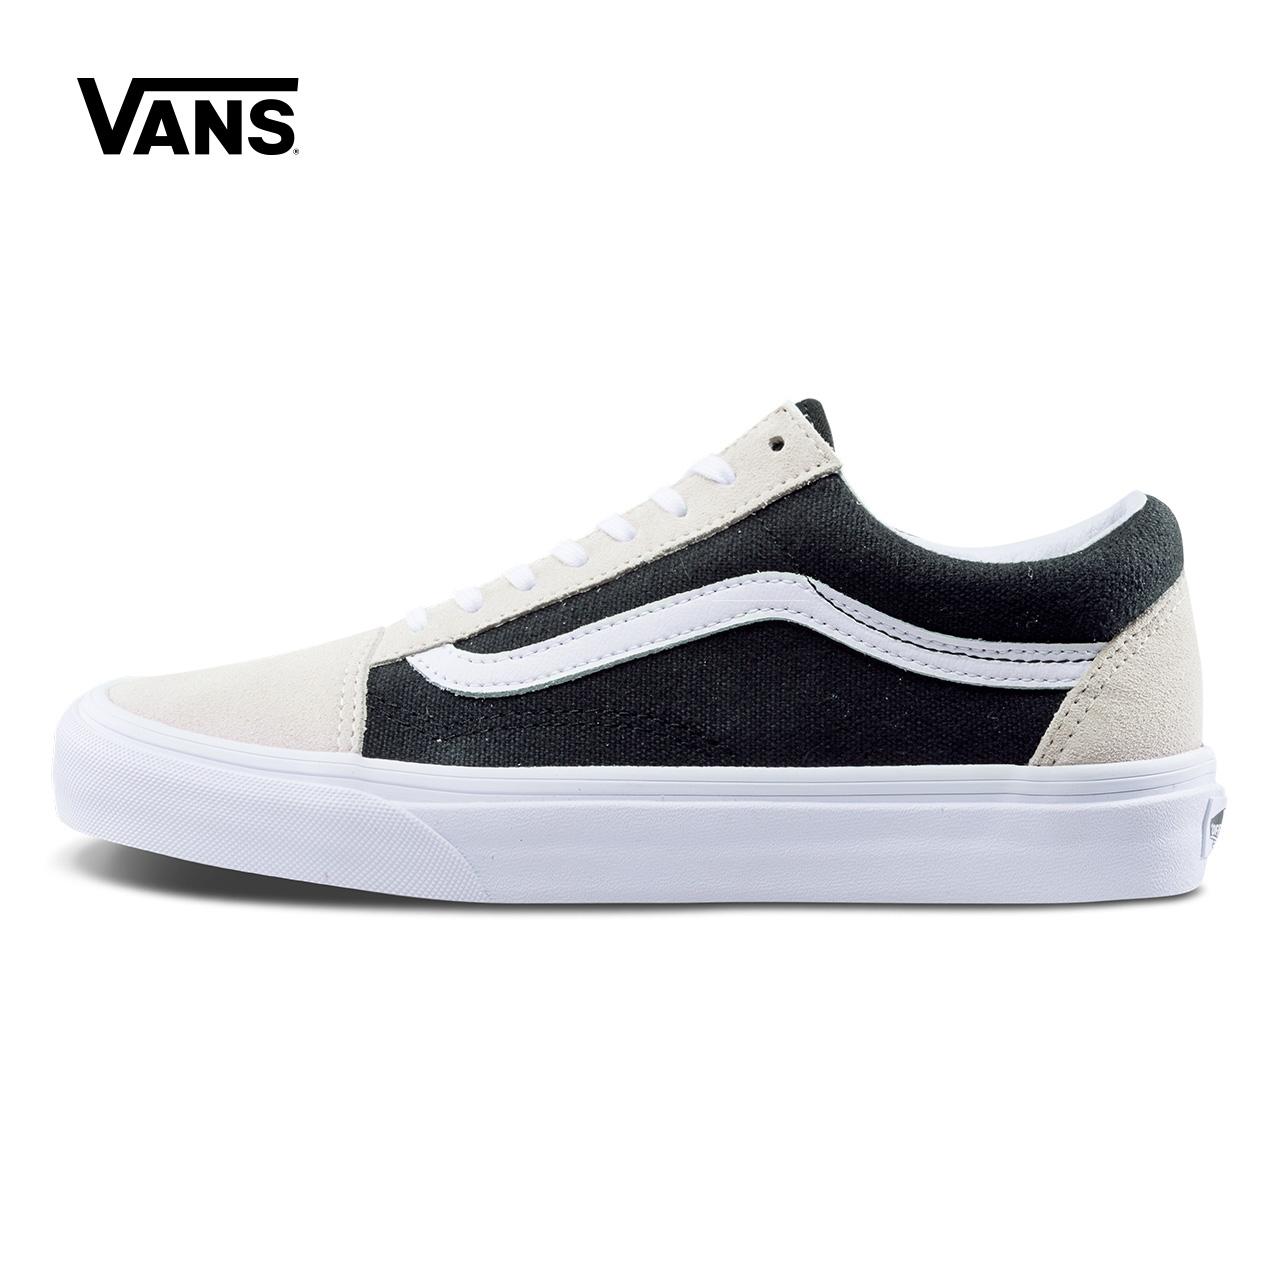 Vans 范斯官方男女款OLD SKOOL板鞋|VN0A38G1OK2